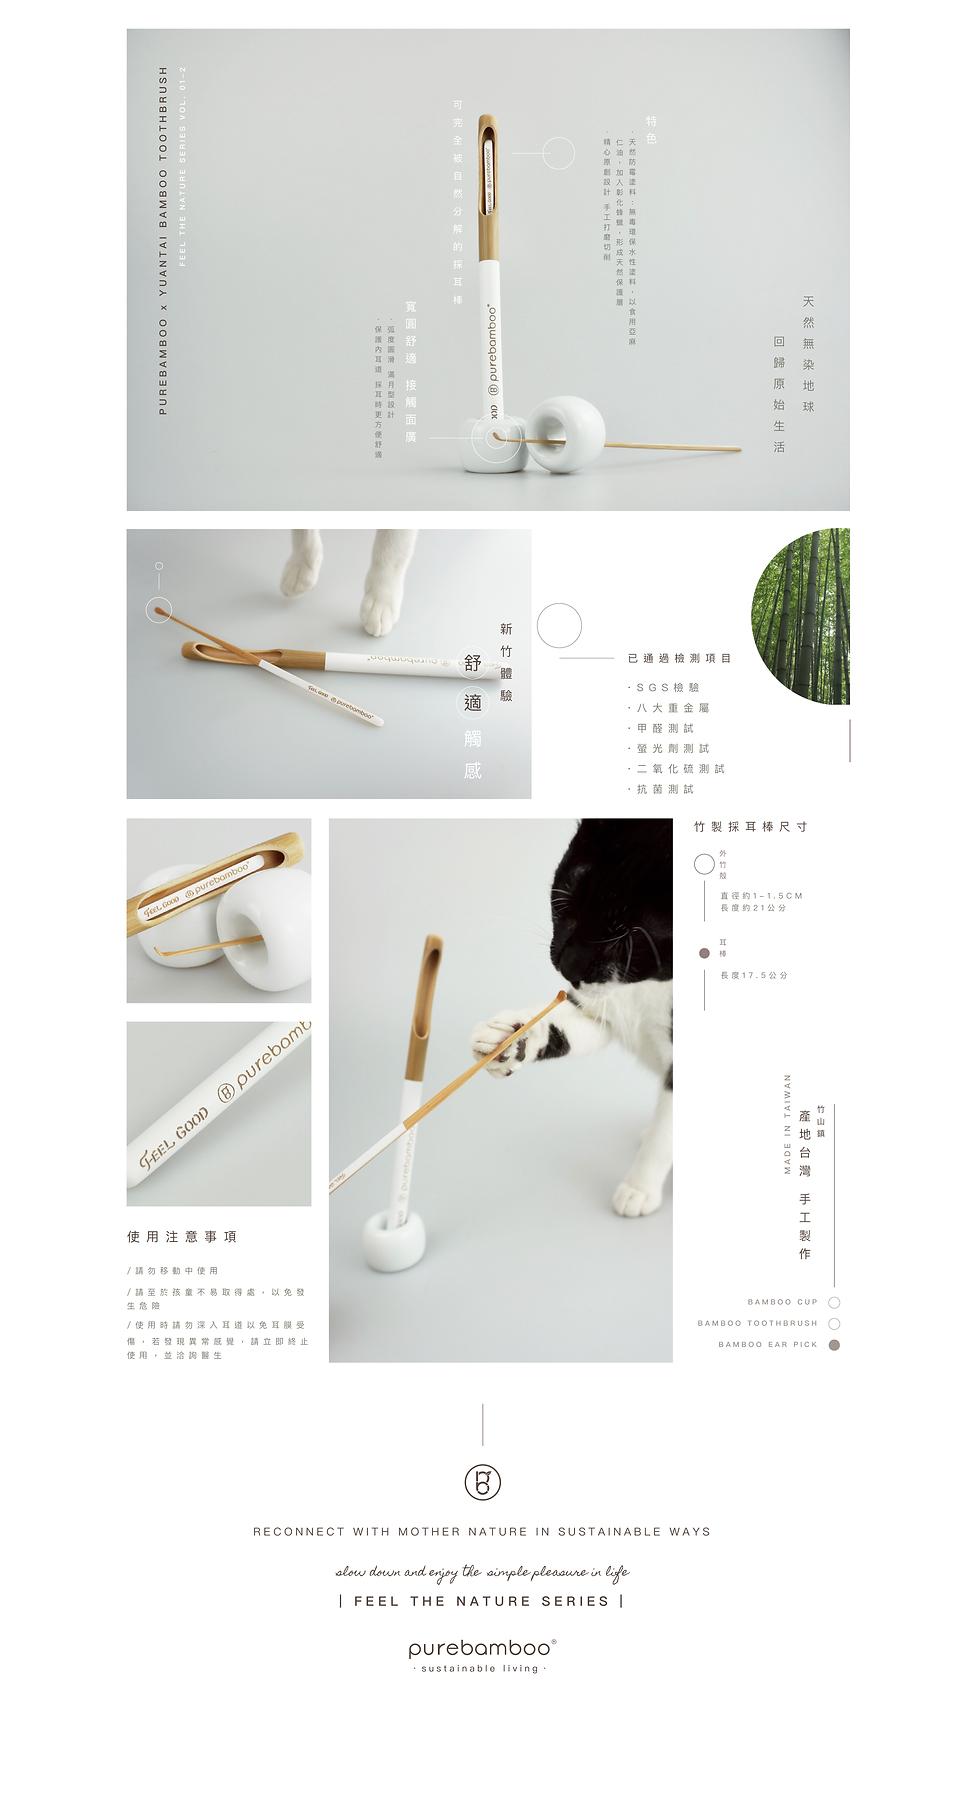 PureBamboo_Bamboo Ear Pick (PNG)_2-3.png